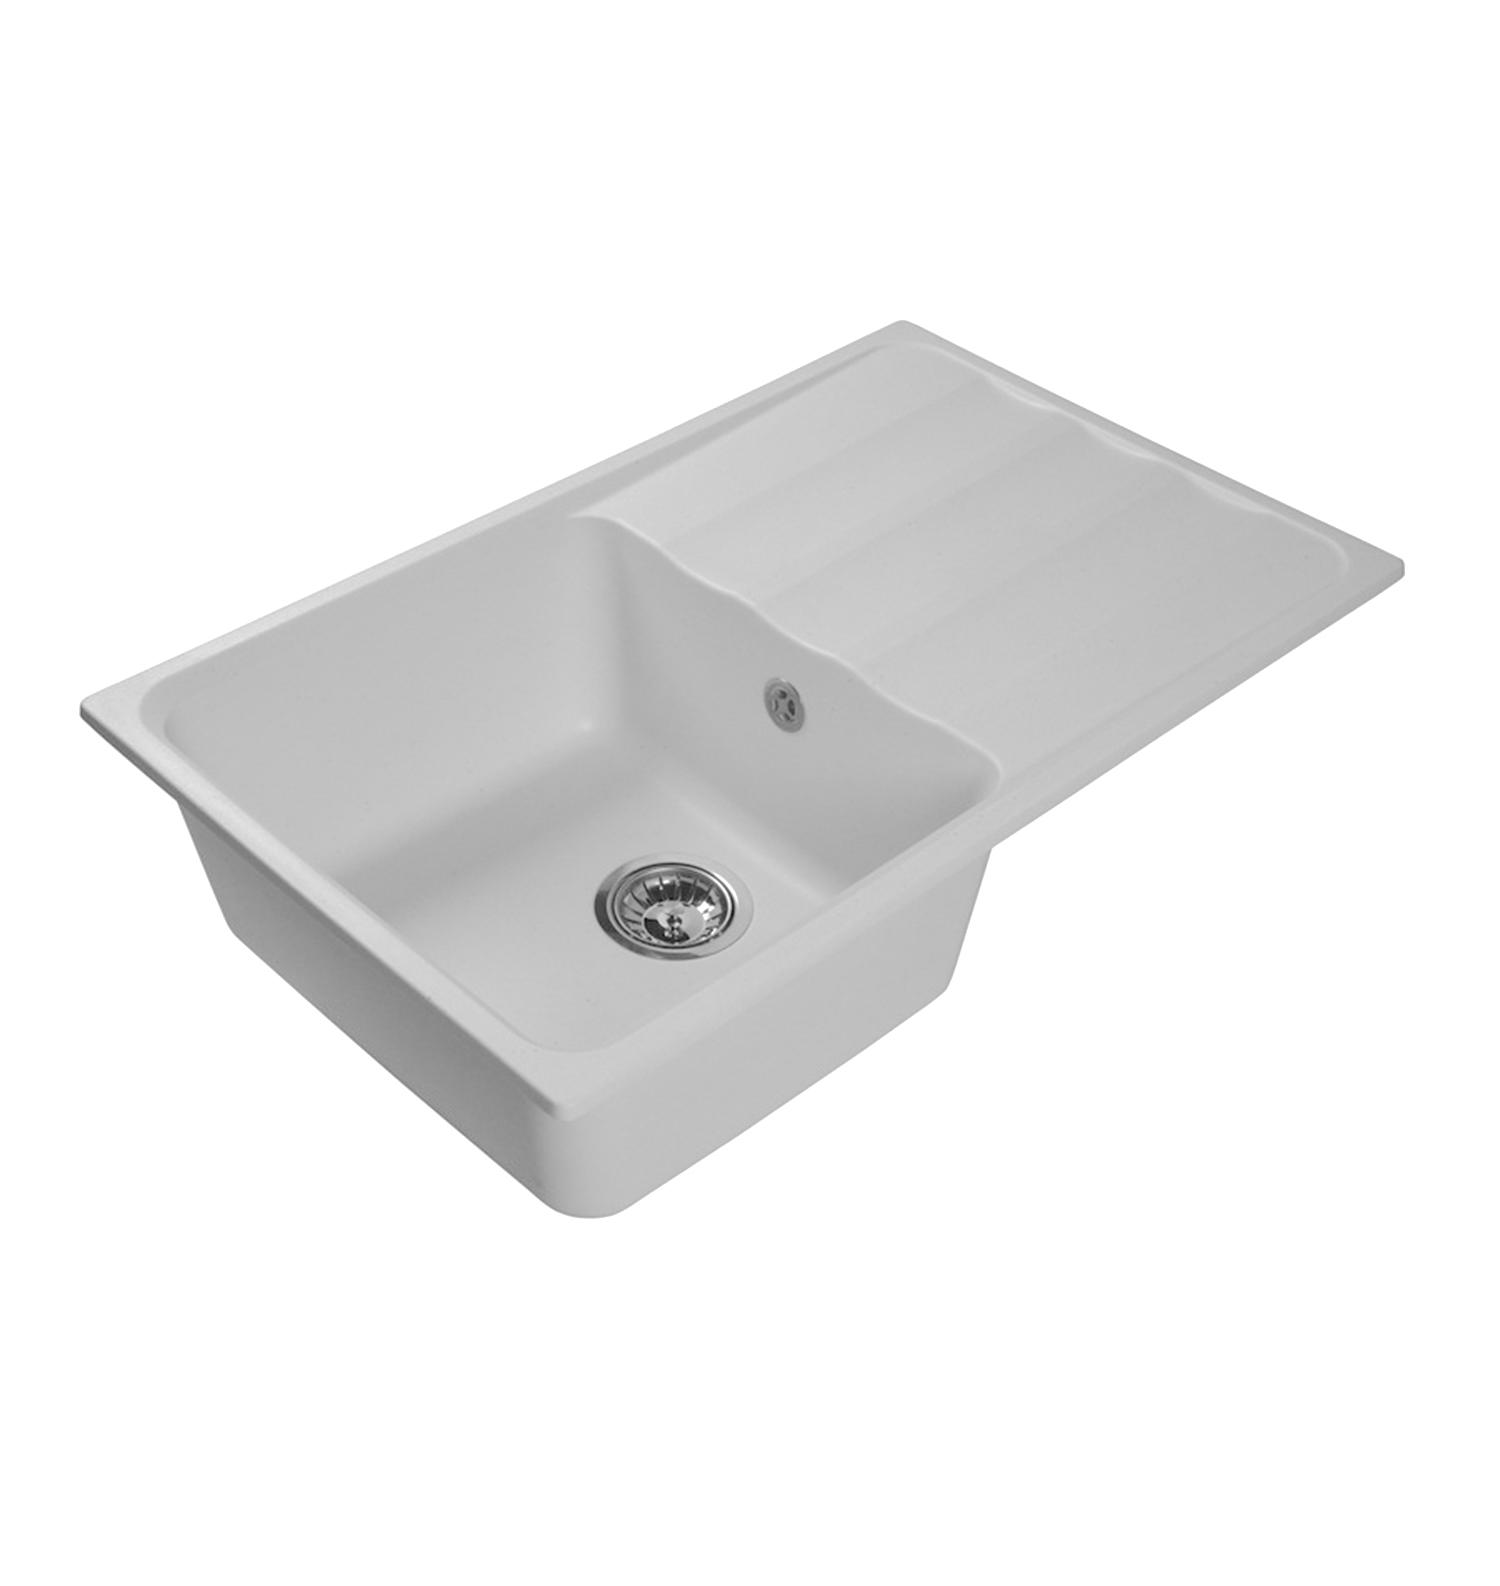 LEX Lucerne 780 White